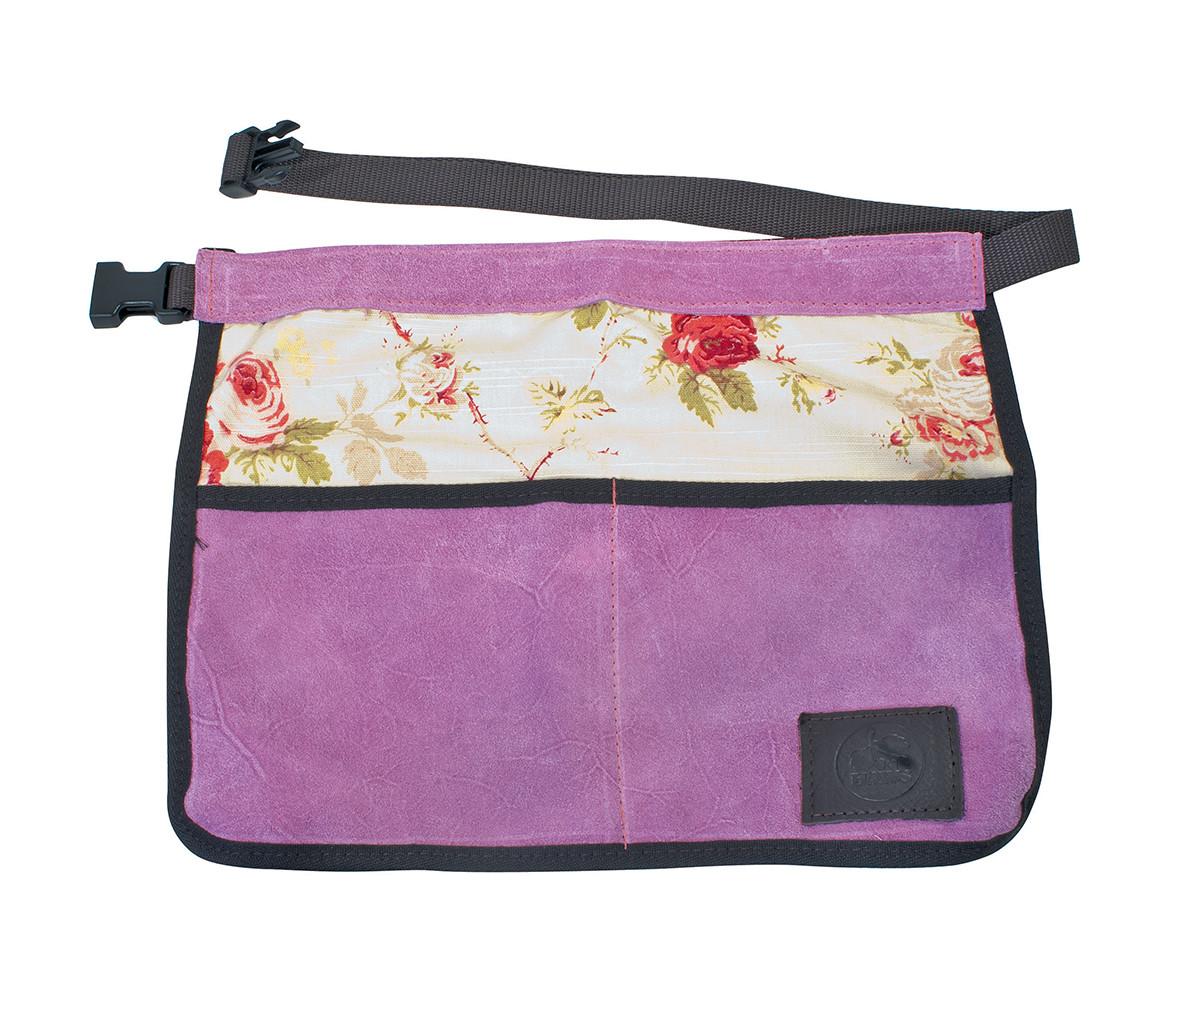 werkzeugsch rze florales muster mandelu. Black Bedroom Furniture Sets. Home Design Ideas